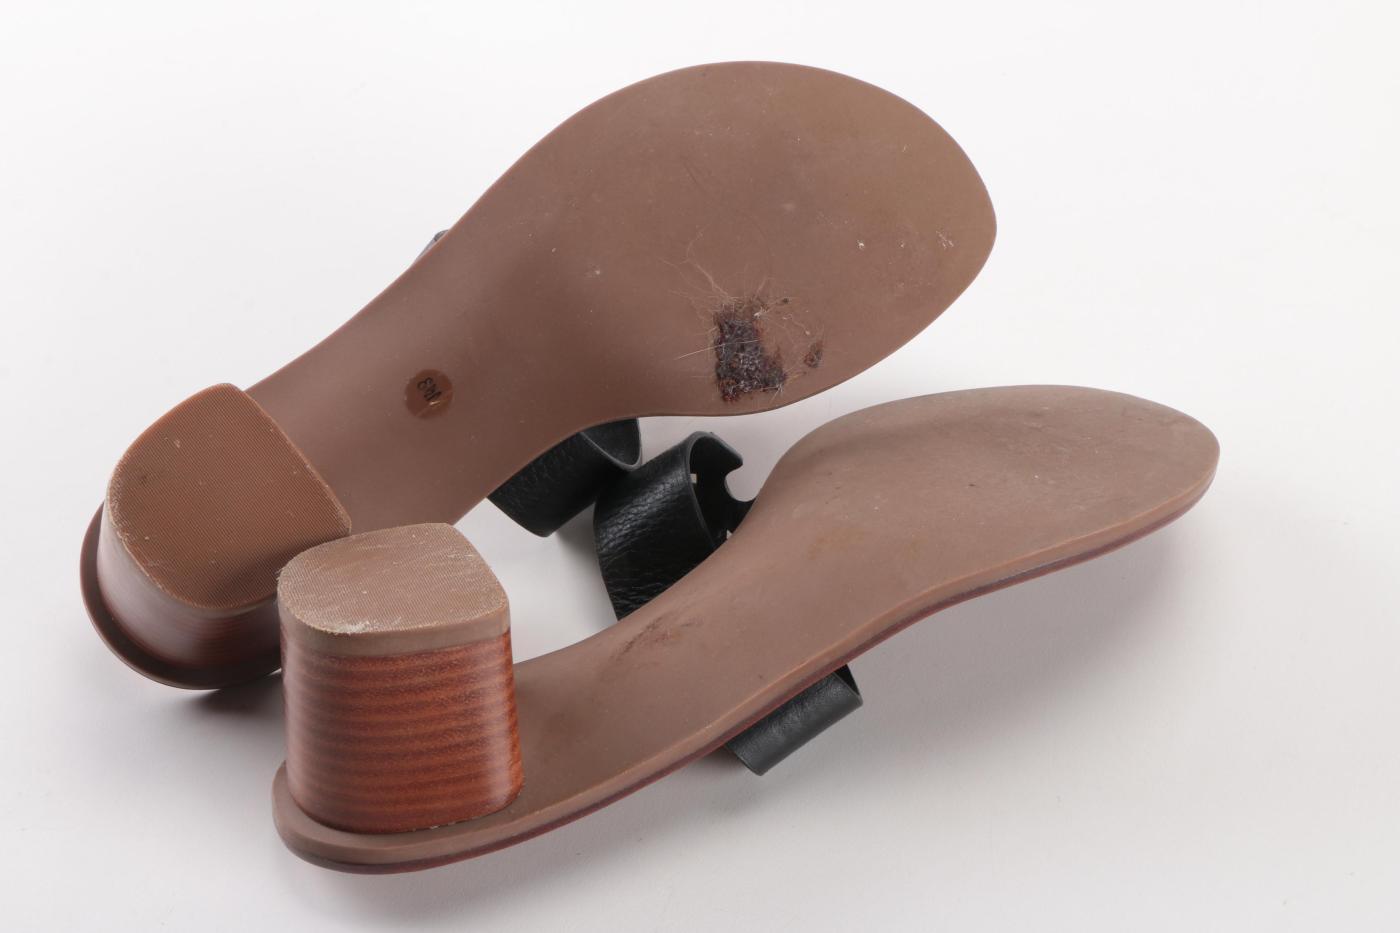 ab7f91145f61 Tory Burch High Heel Boots - Ivoiregion